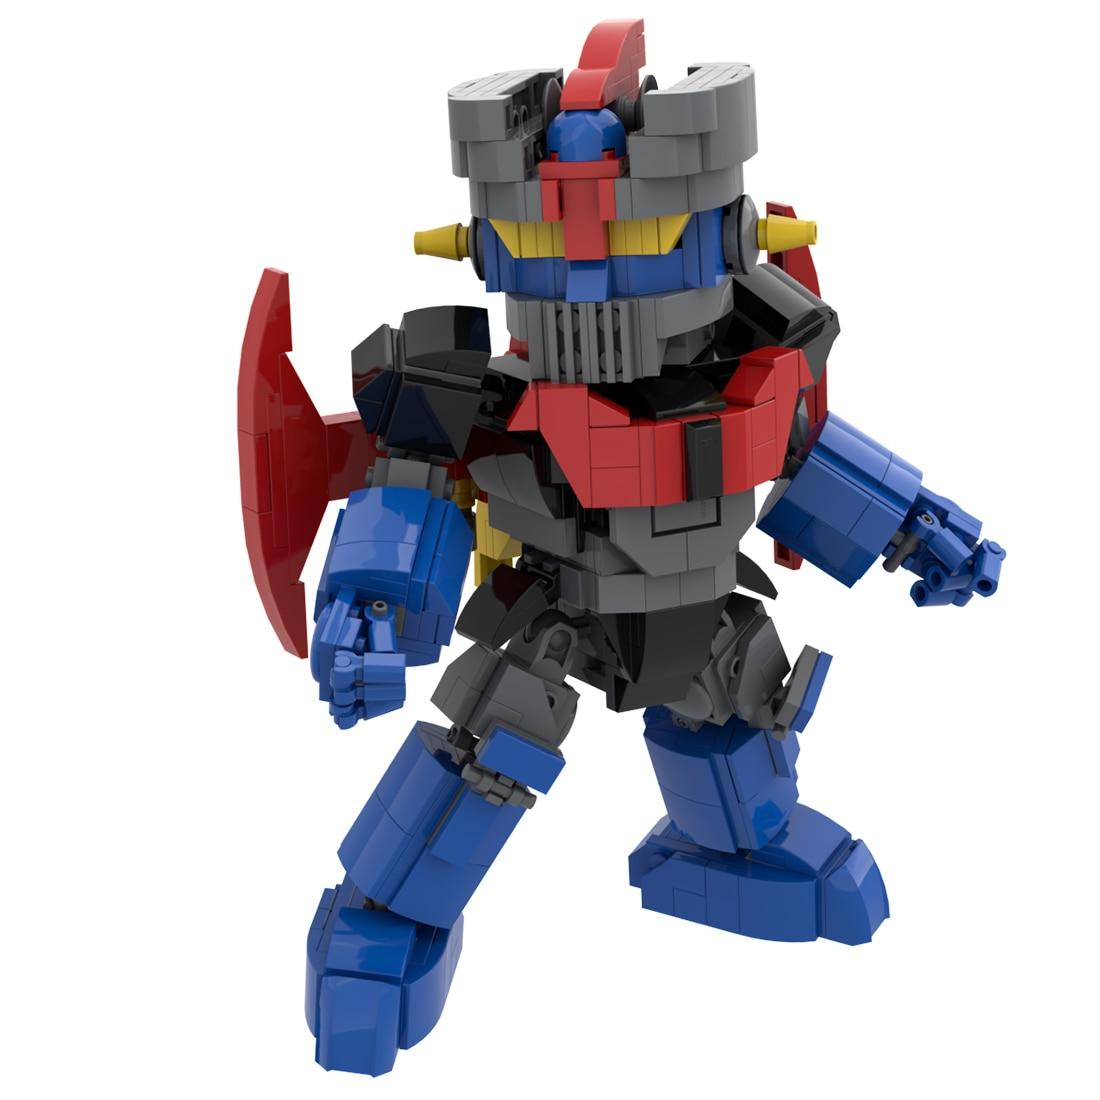 619Pcs/Set Moc Superalloy Combat Robot Model Assembly Small Particle Building Blocks Educational Toy Set DIY Science Remote